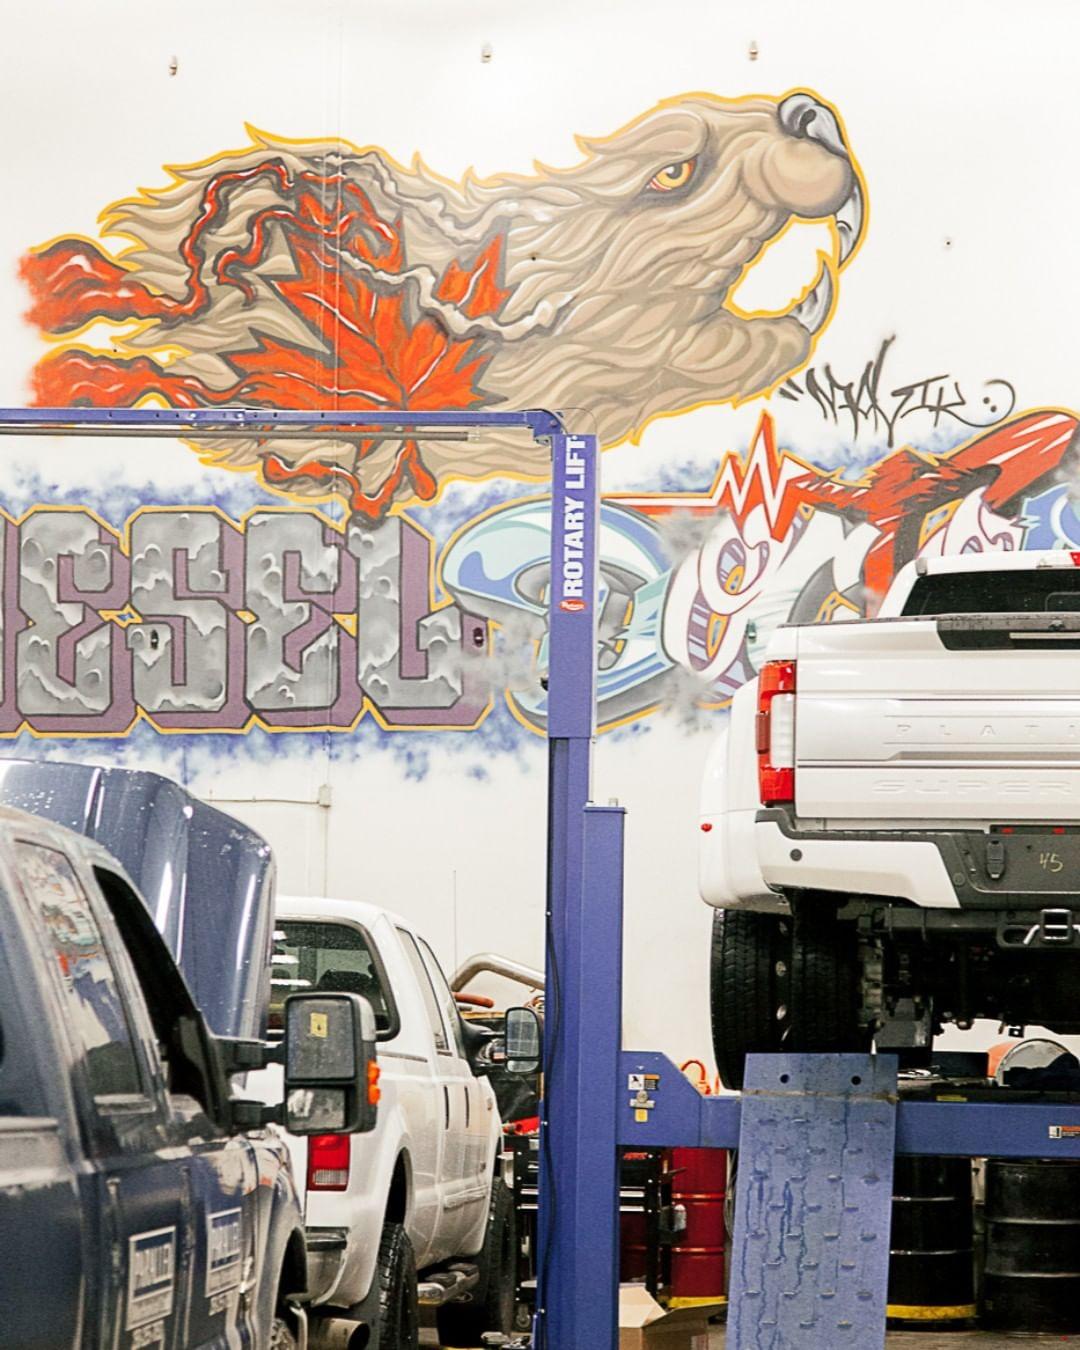 Ford F-350 Plati in the DieselDoctor.ca shop